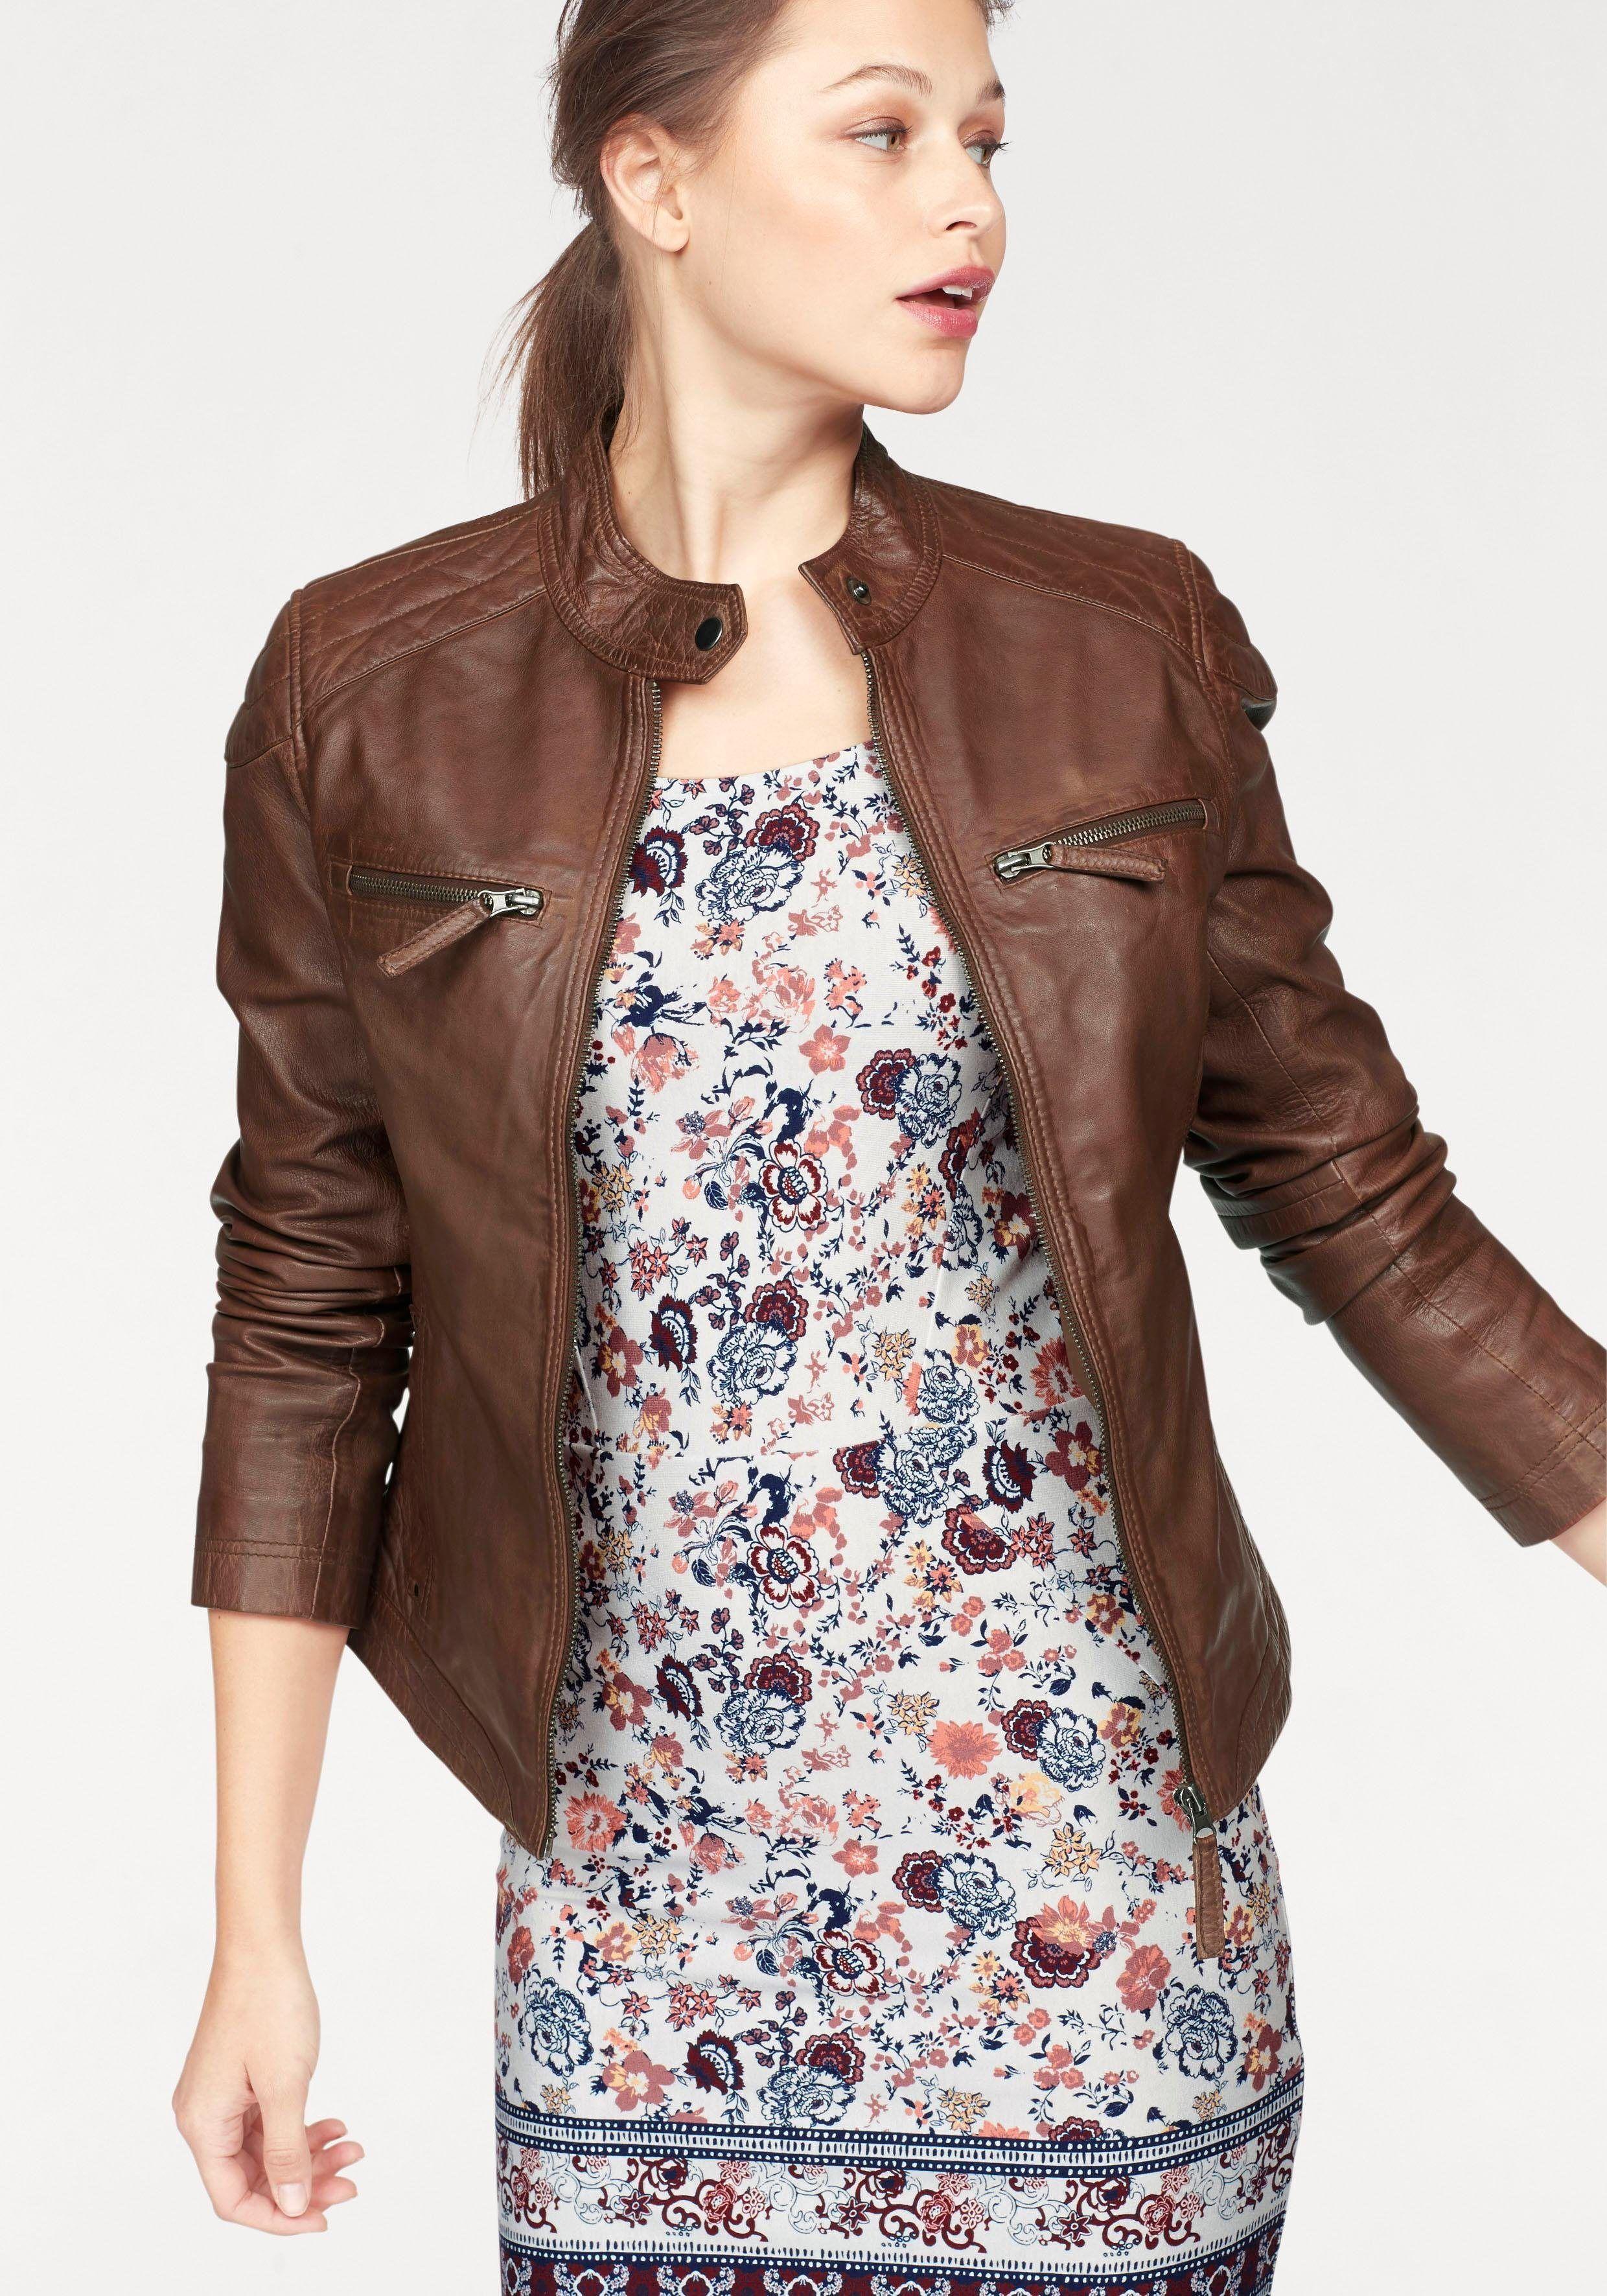 Damen Lederjacken und Jacken | Bomboogie®